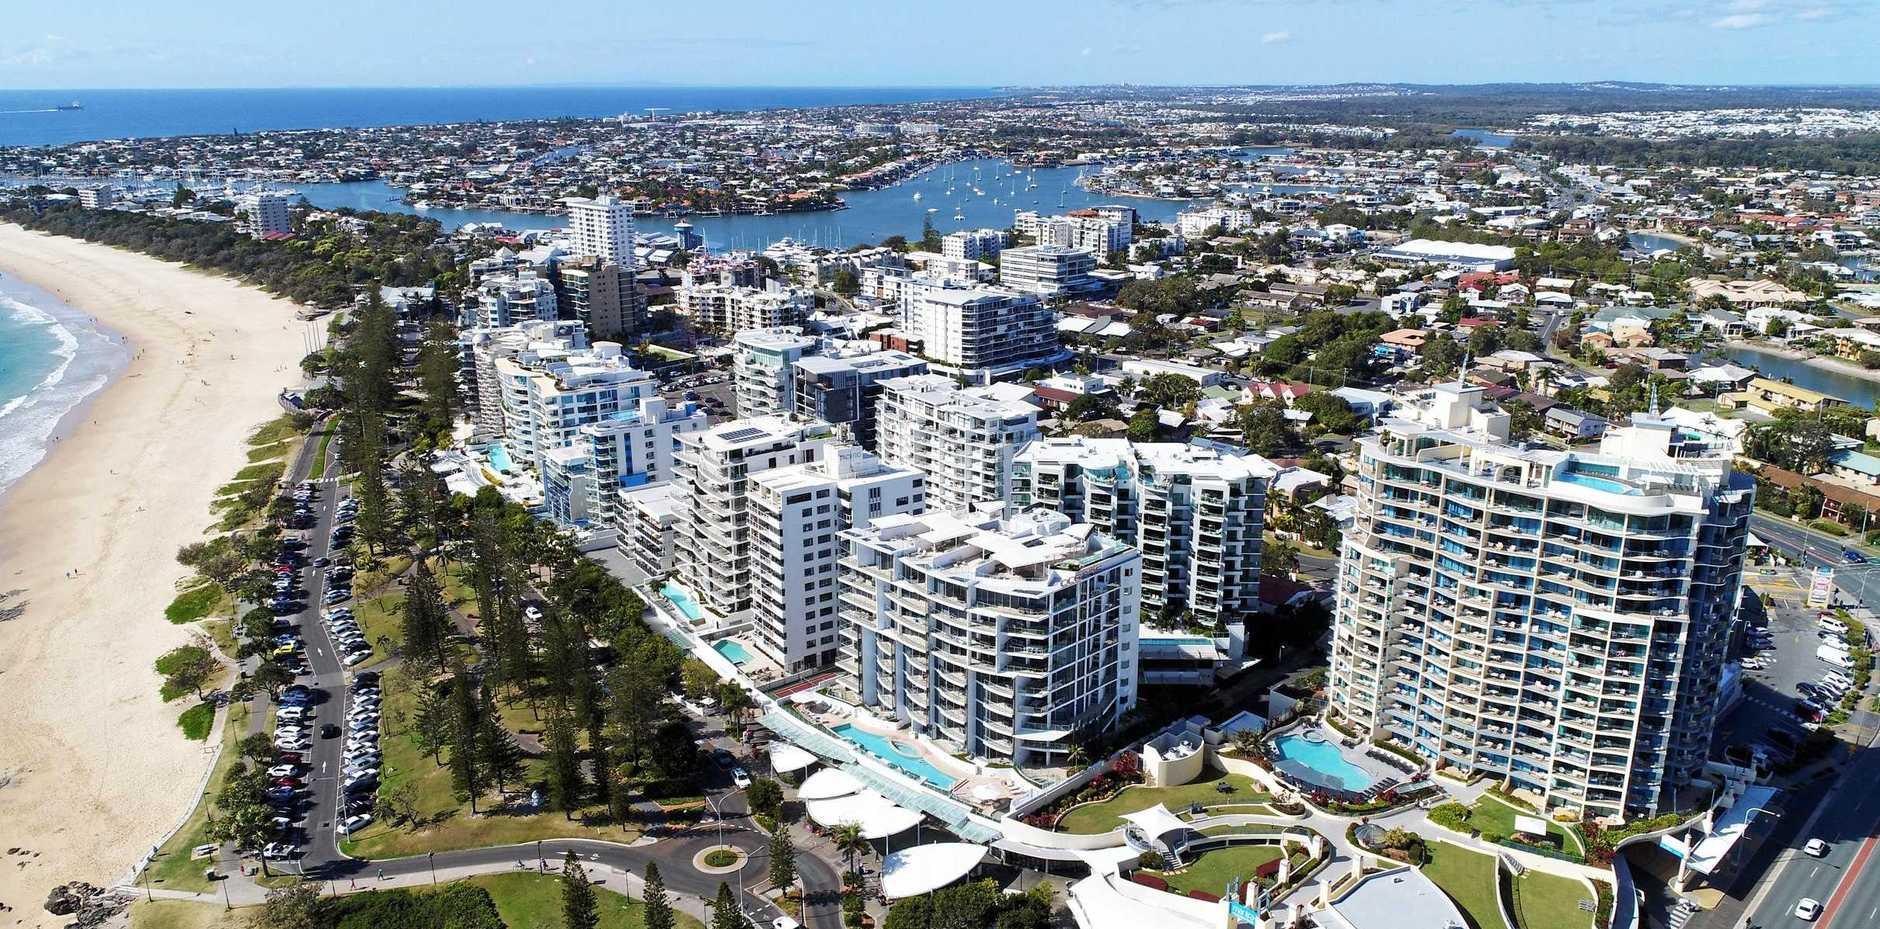 DRONE: Aerial photos of Mooloolaba, Alexandra Headland, Sunshine Coast.